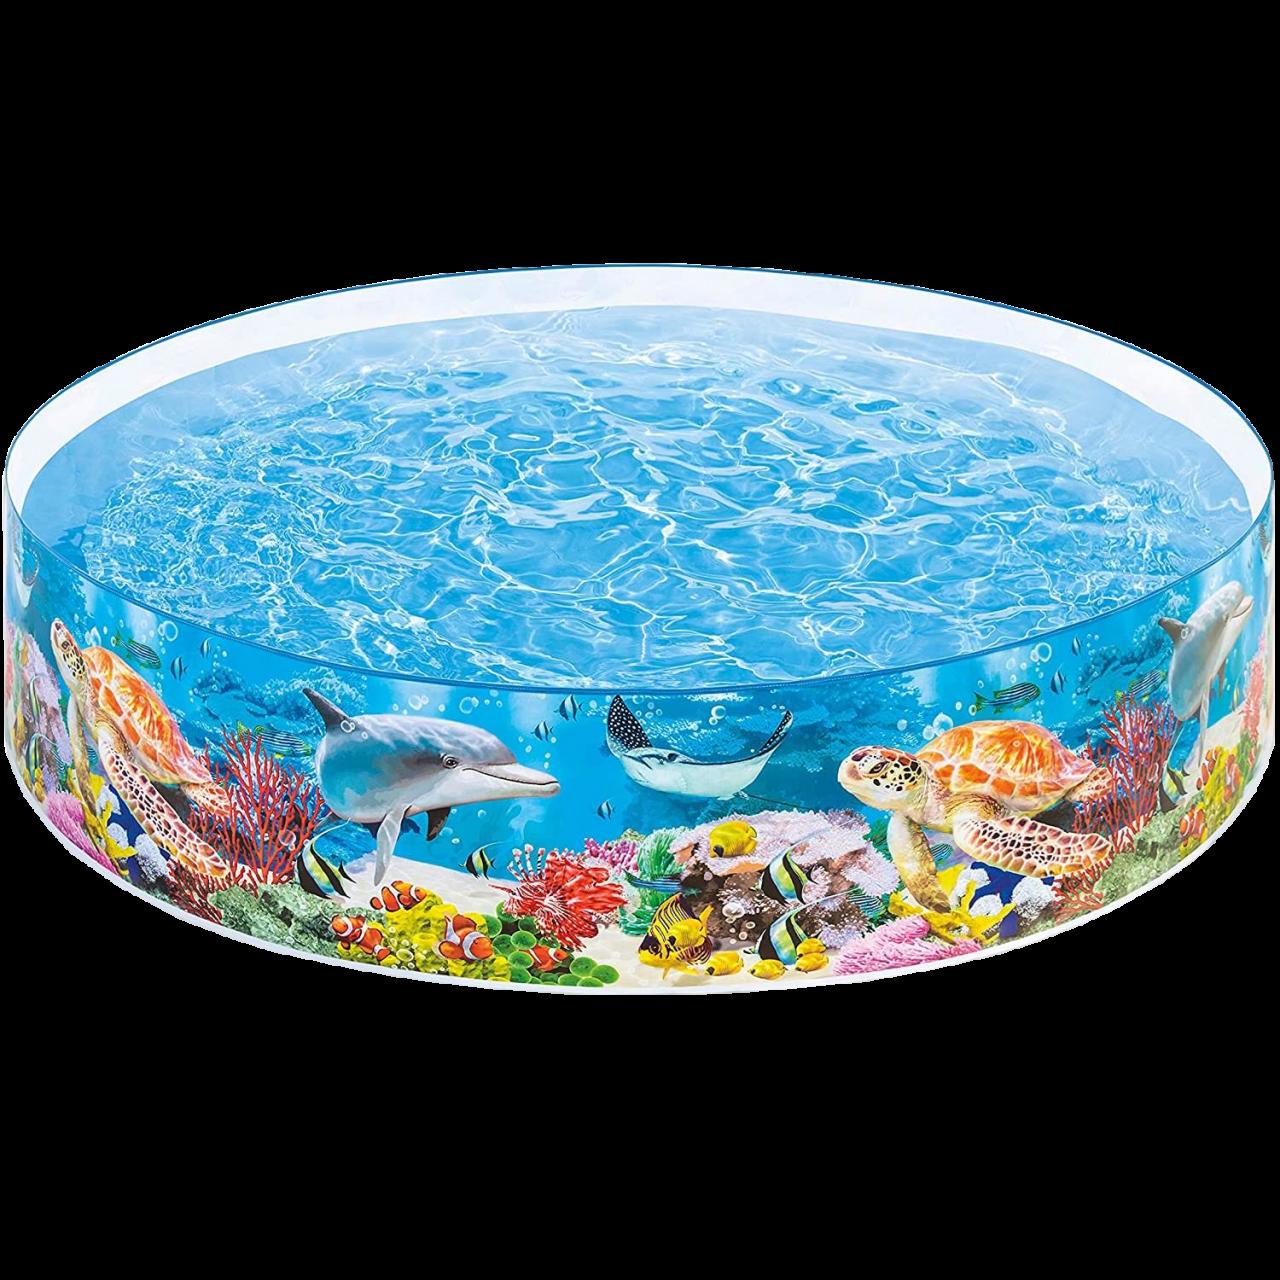 Intex 58472NP Snap-Set Coral Reef Pool 244 x 46 cm Planschbecken Kinderbecken